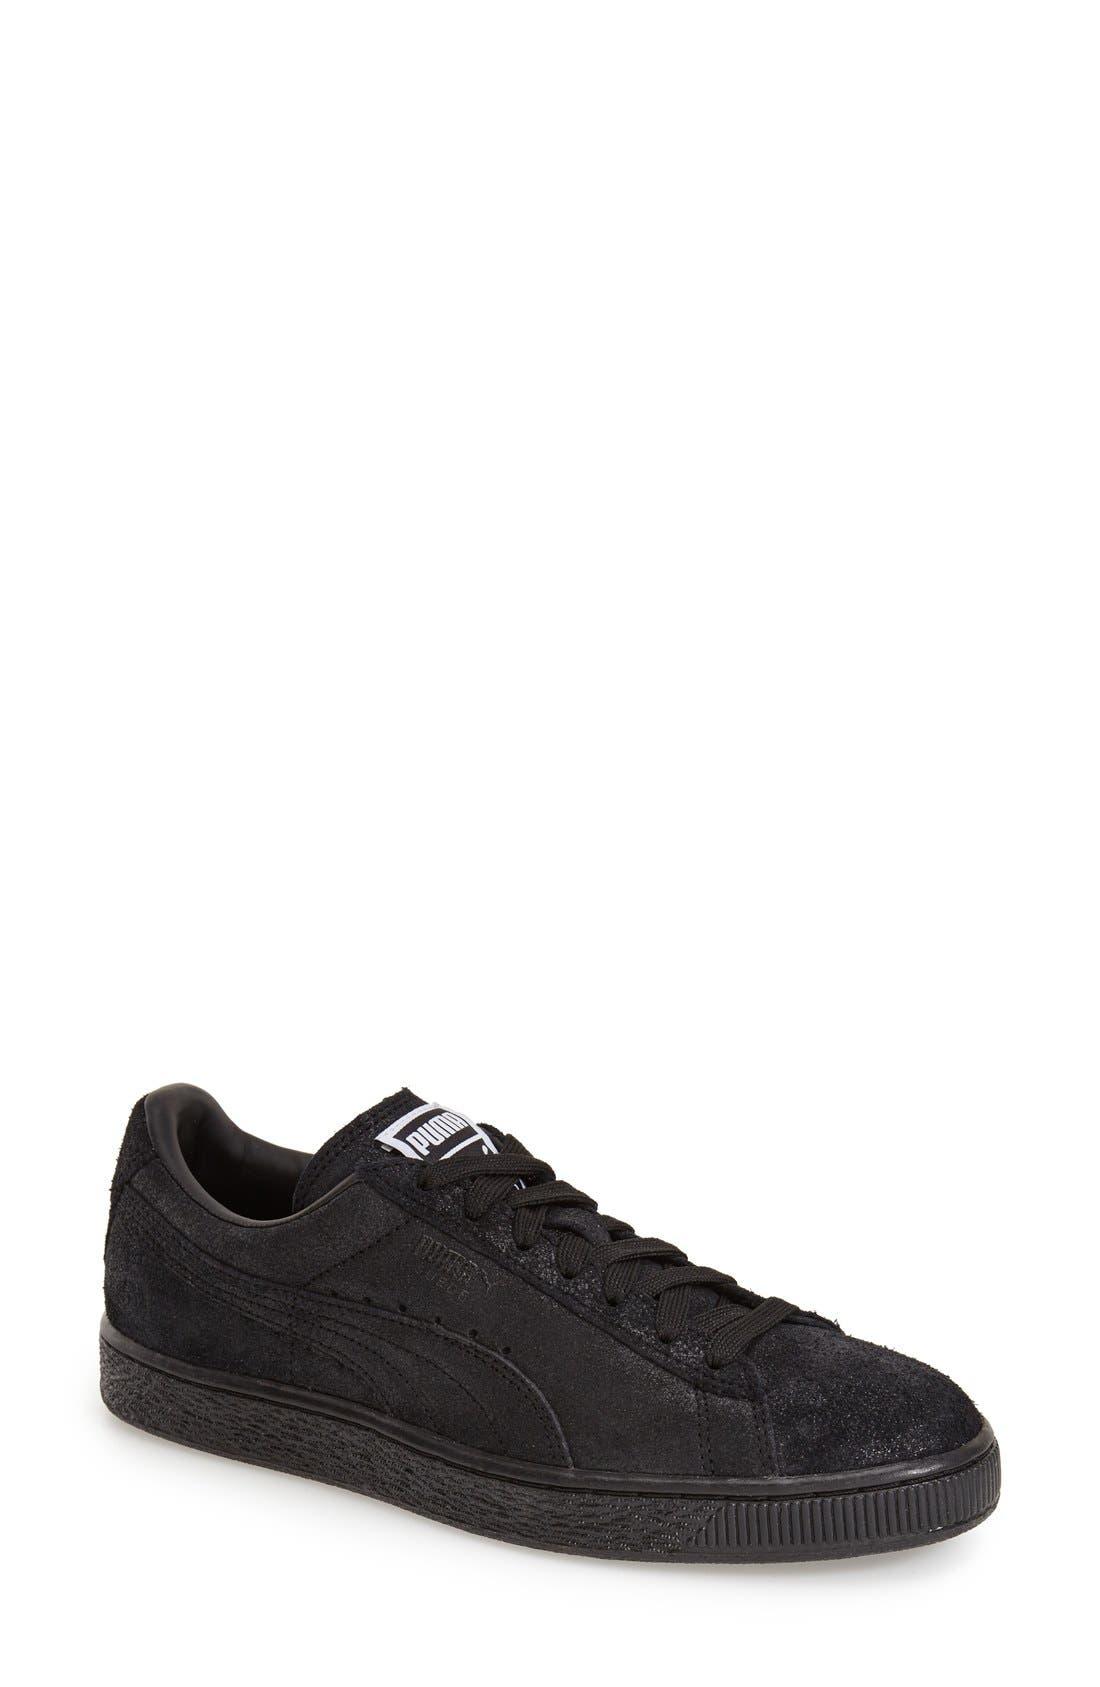 Alternate Image 1 Selected - PUMA 'Suede Classic' Sneaker (Women)